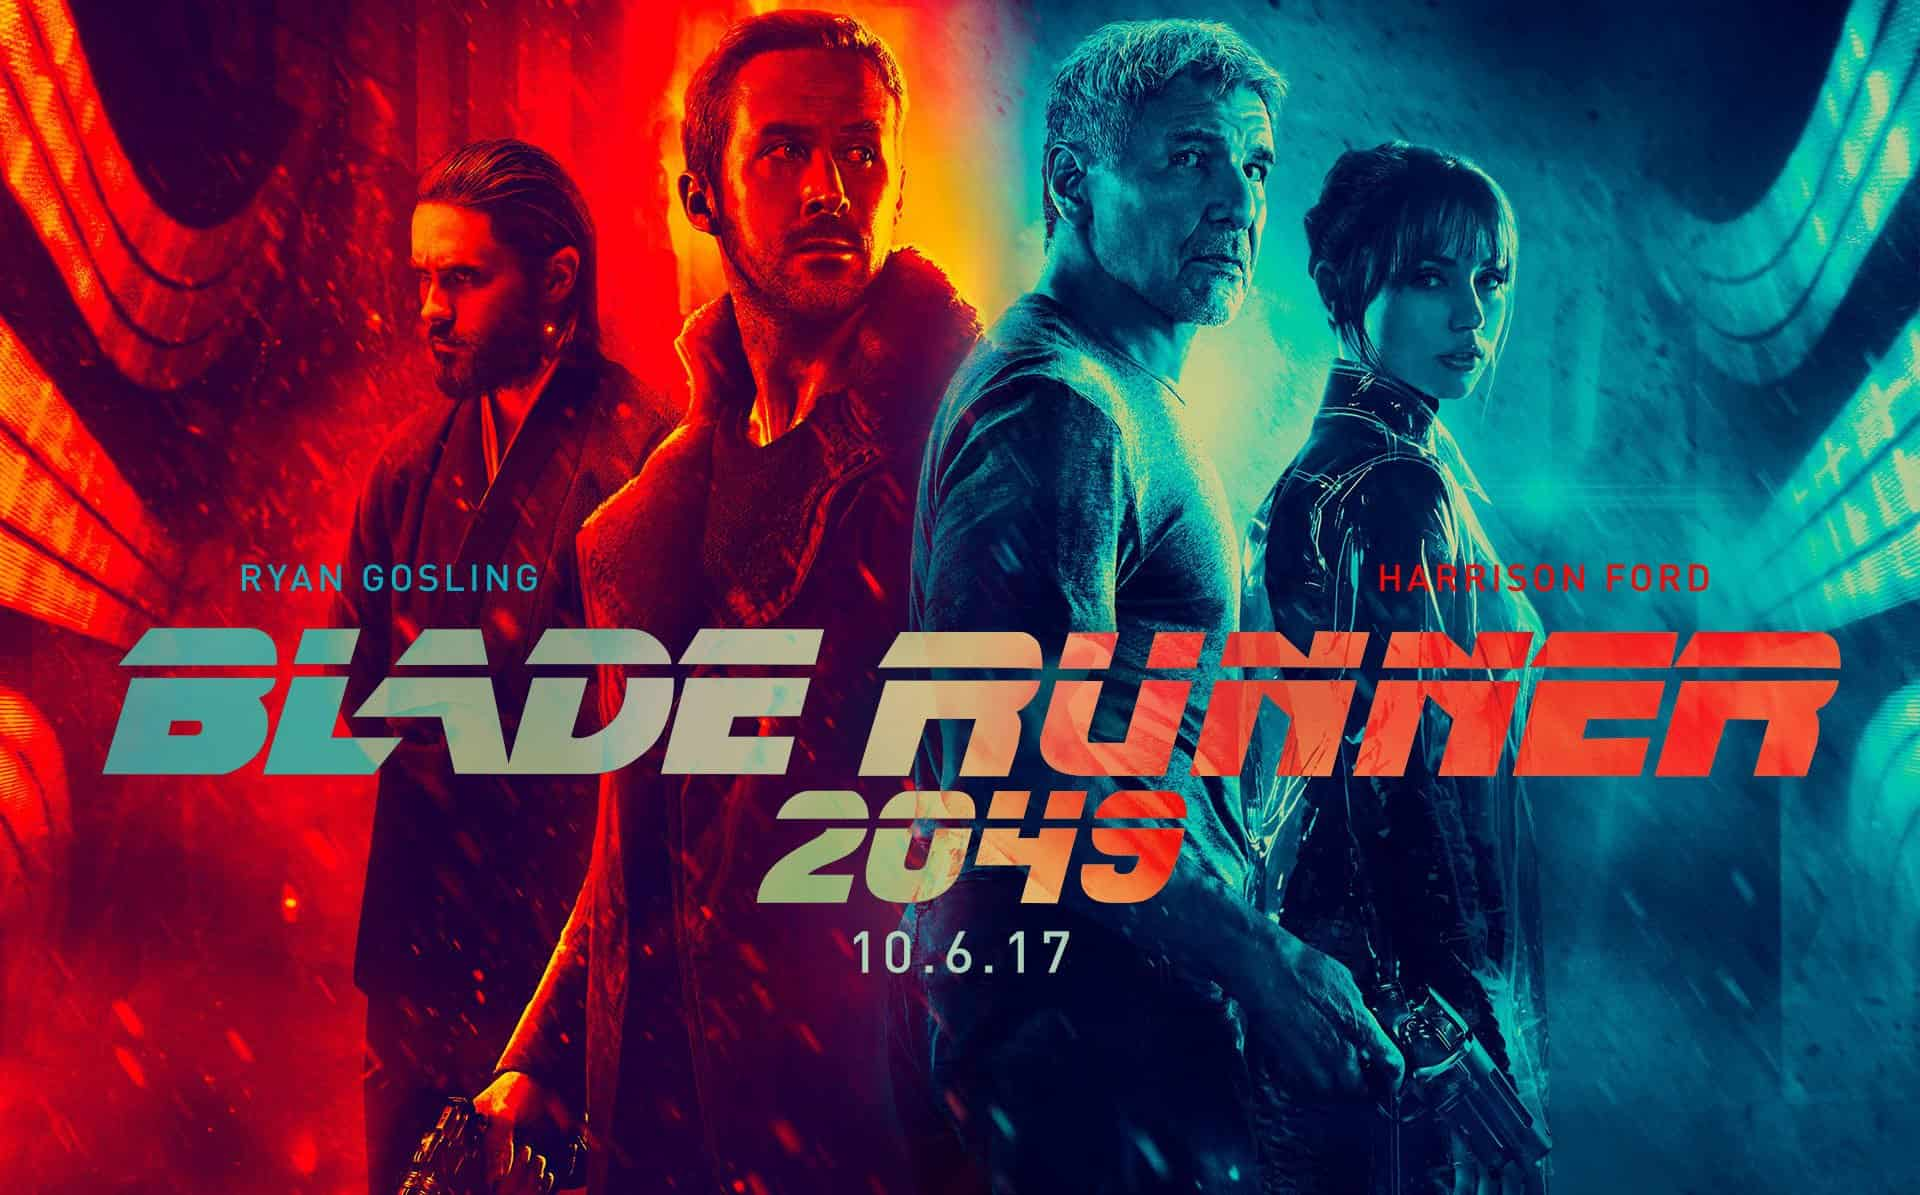 Ecco 3 film imperdibili di Denis Villeneuve aspettando l'uscita di Blade Runner 2049